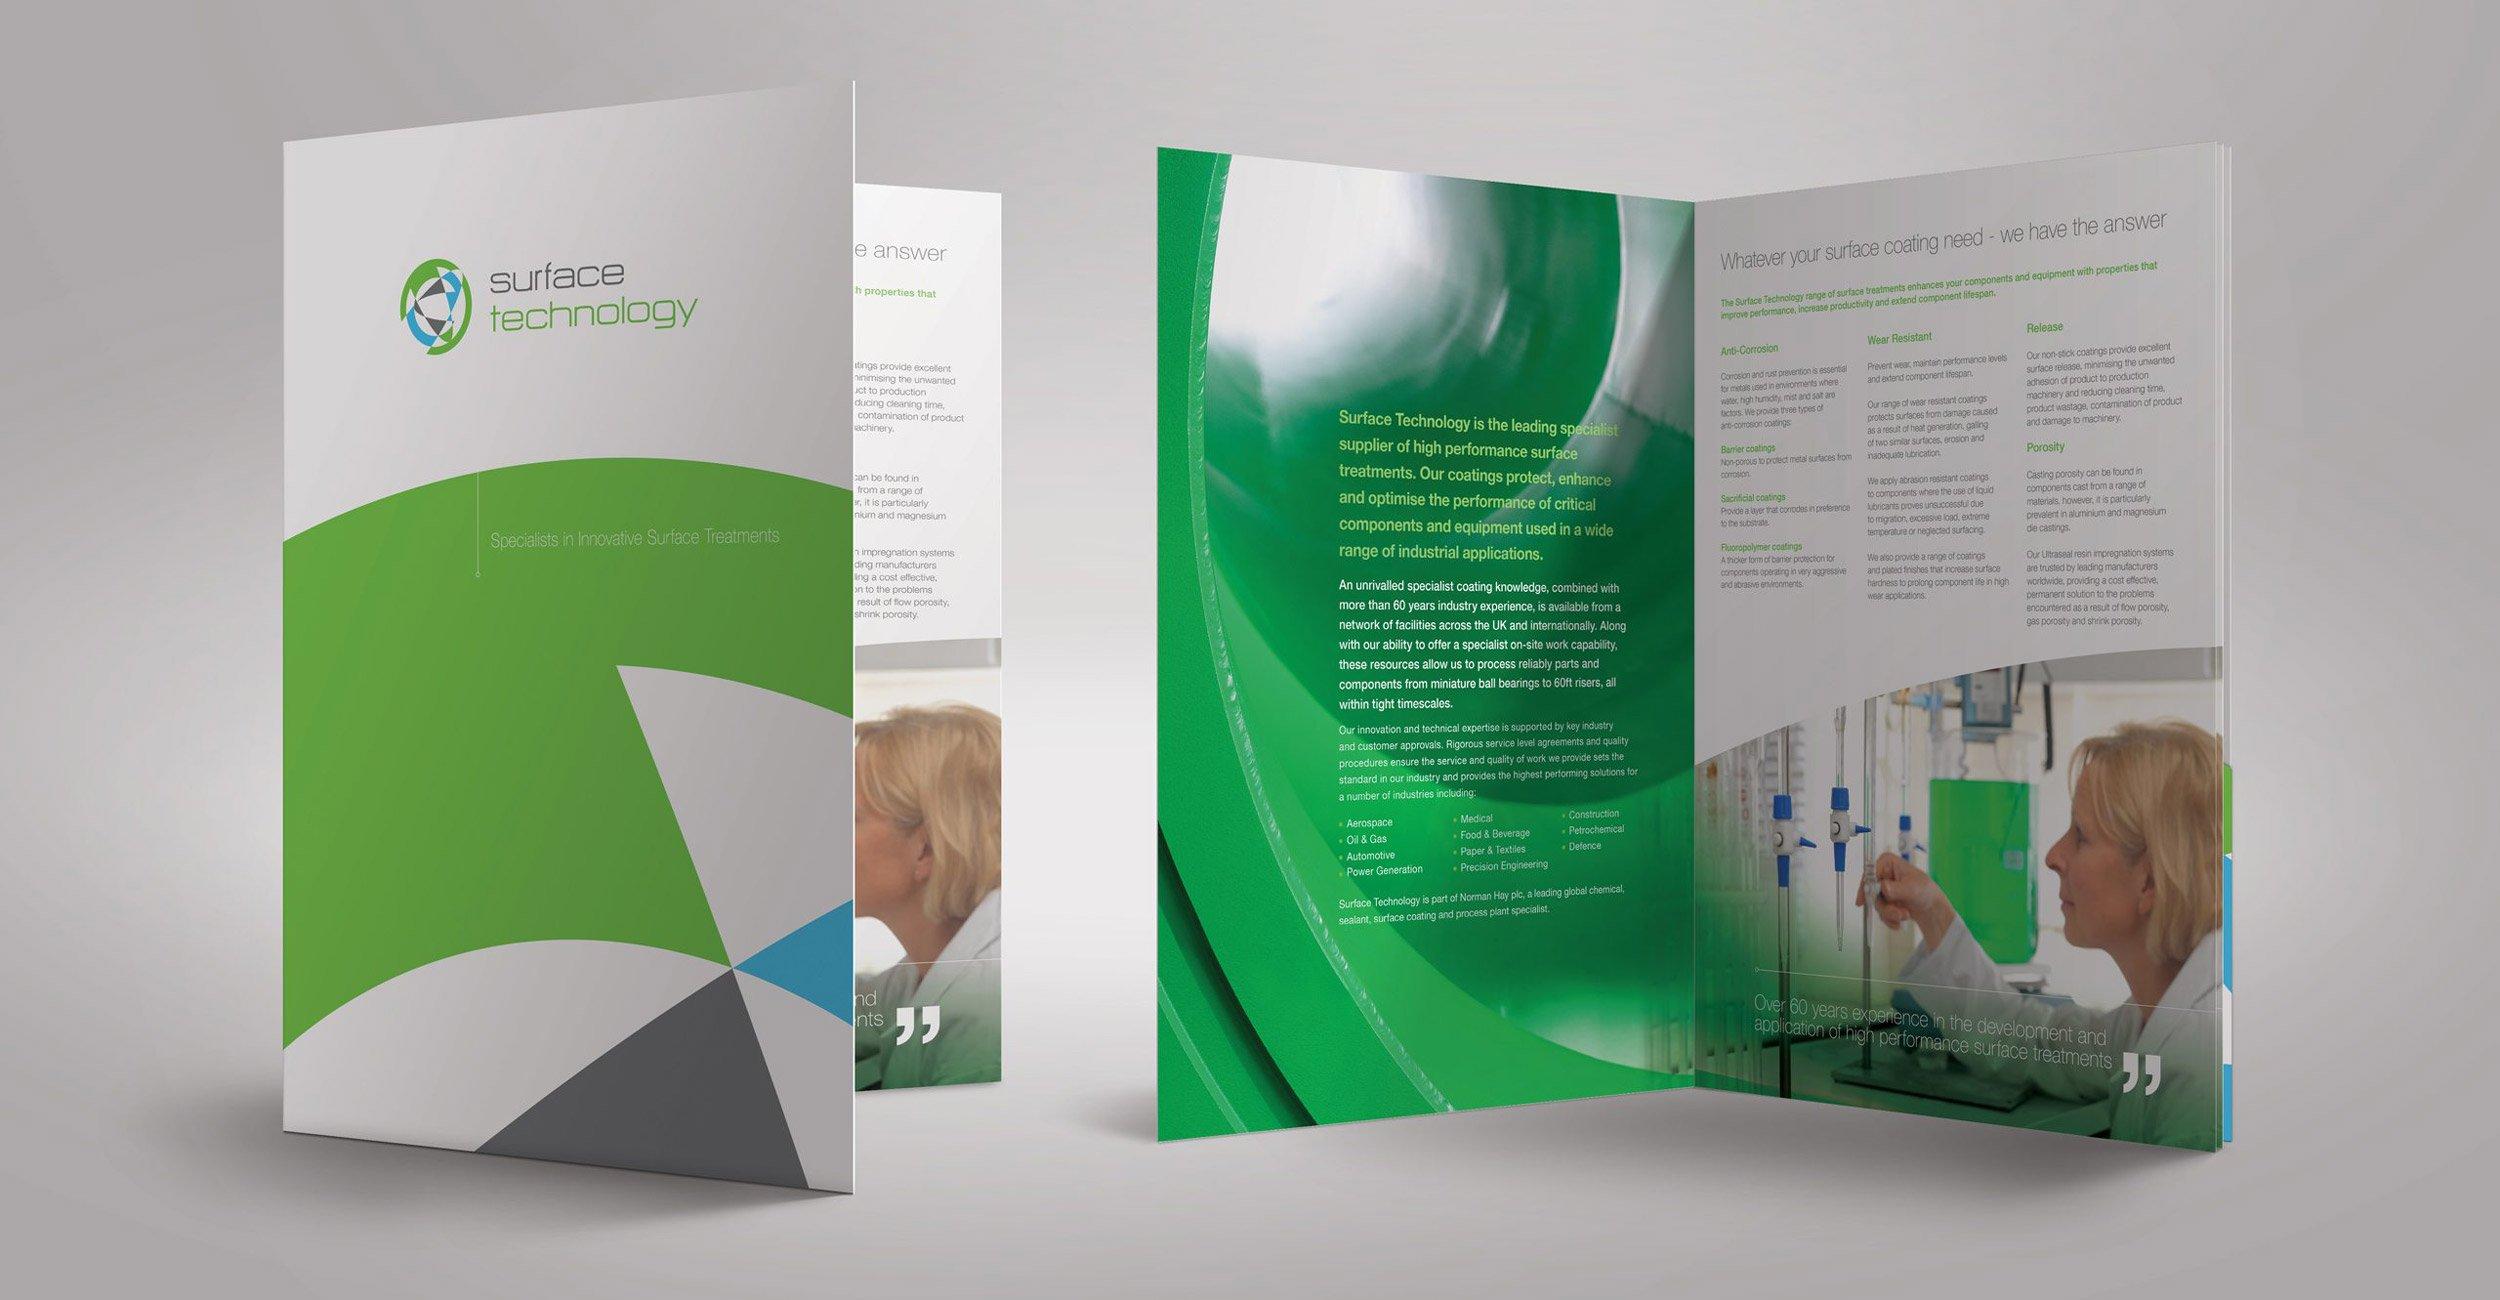 Surface technology Brochure Design